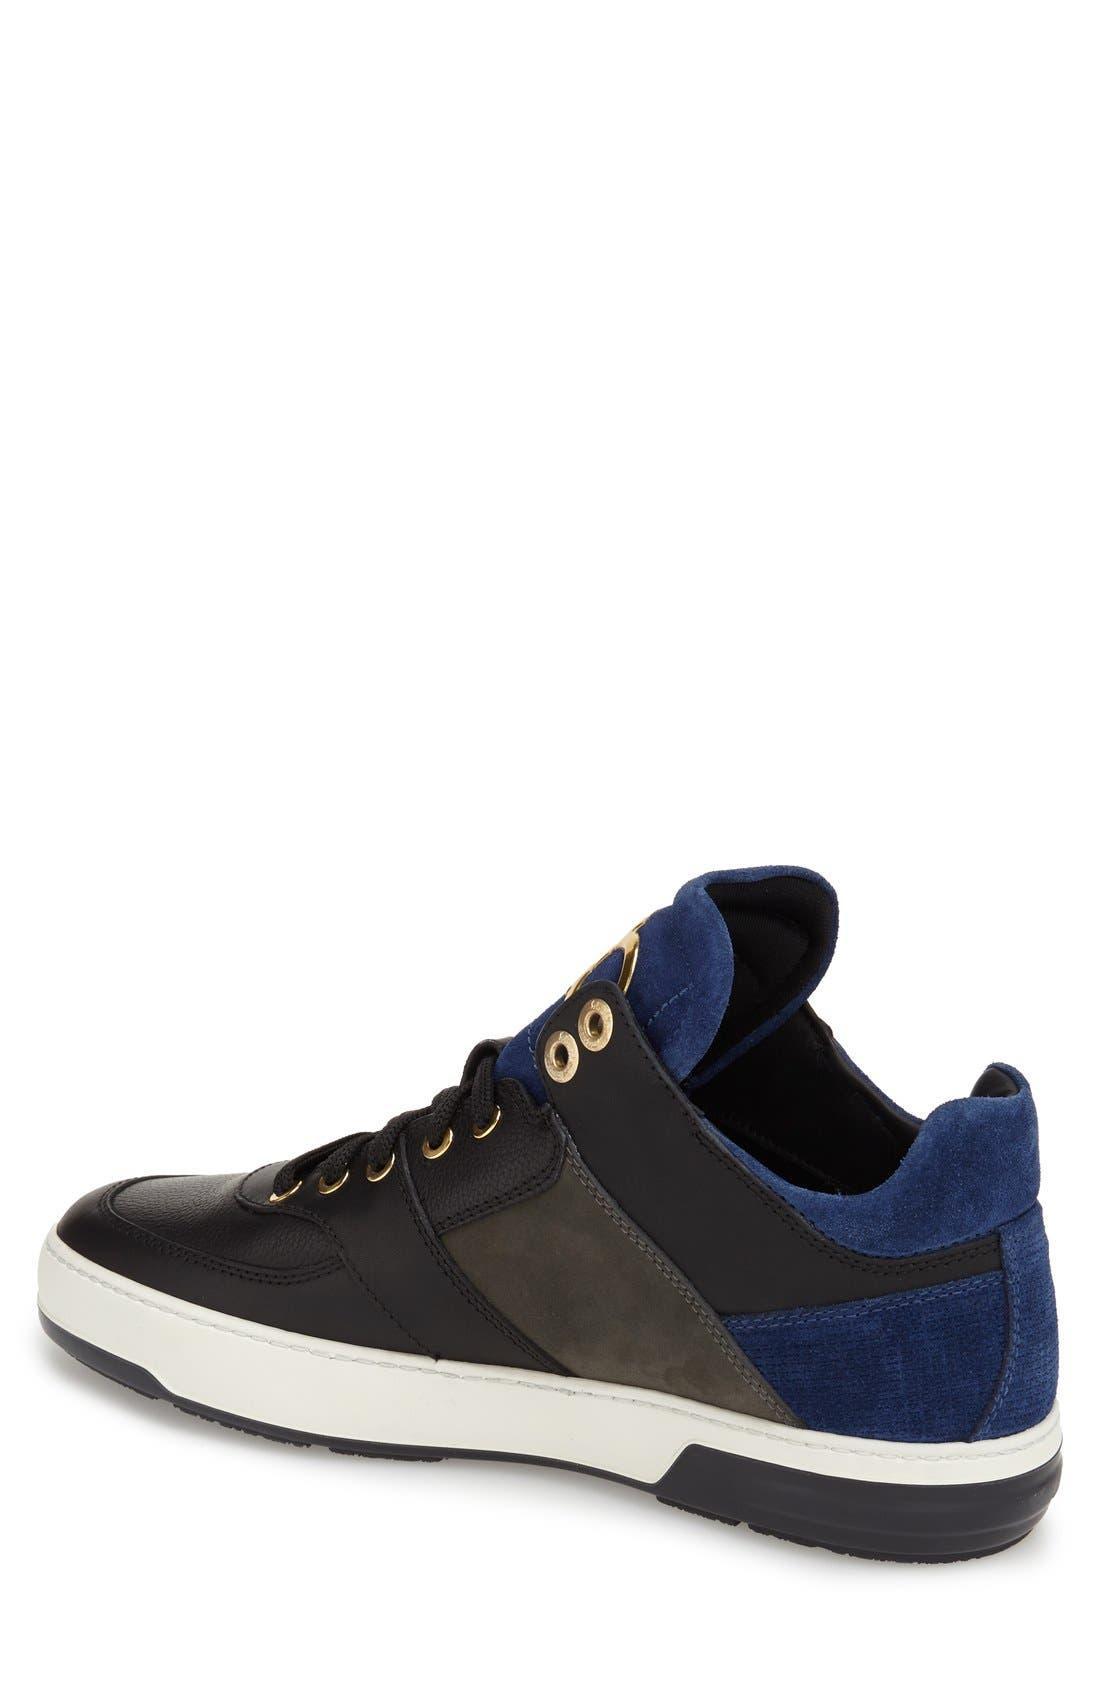 'Monroe' Sneaker,                             Alternate thumbnail 3, color,                             004